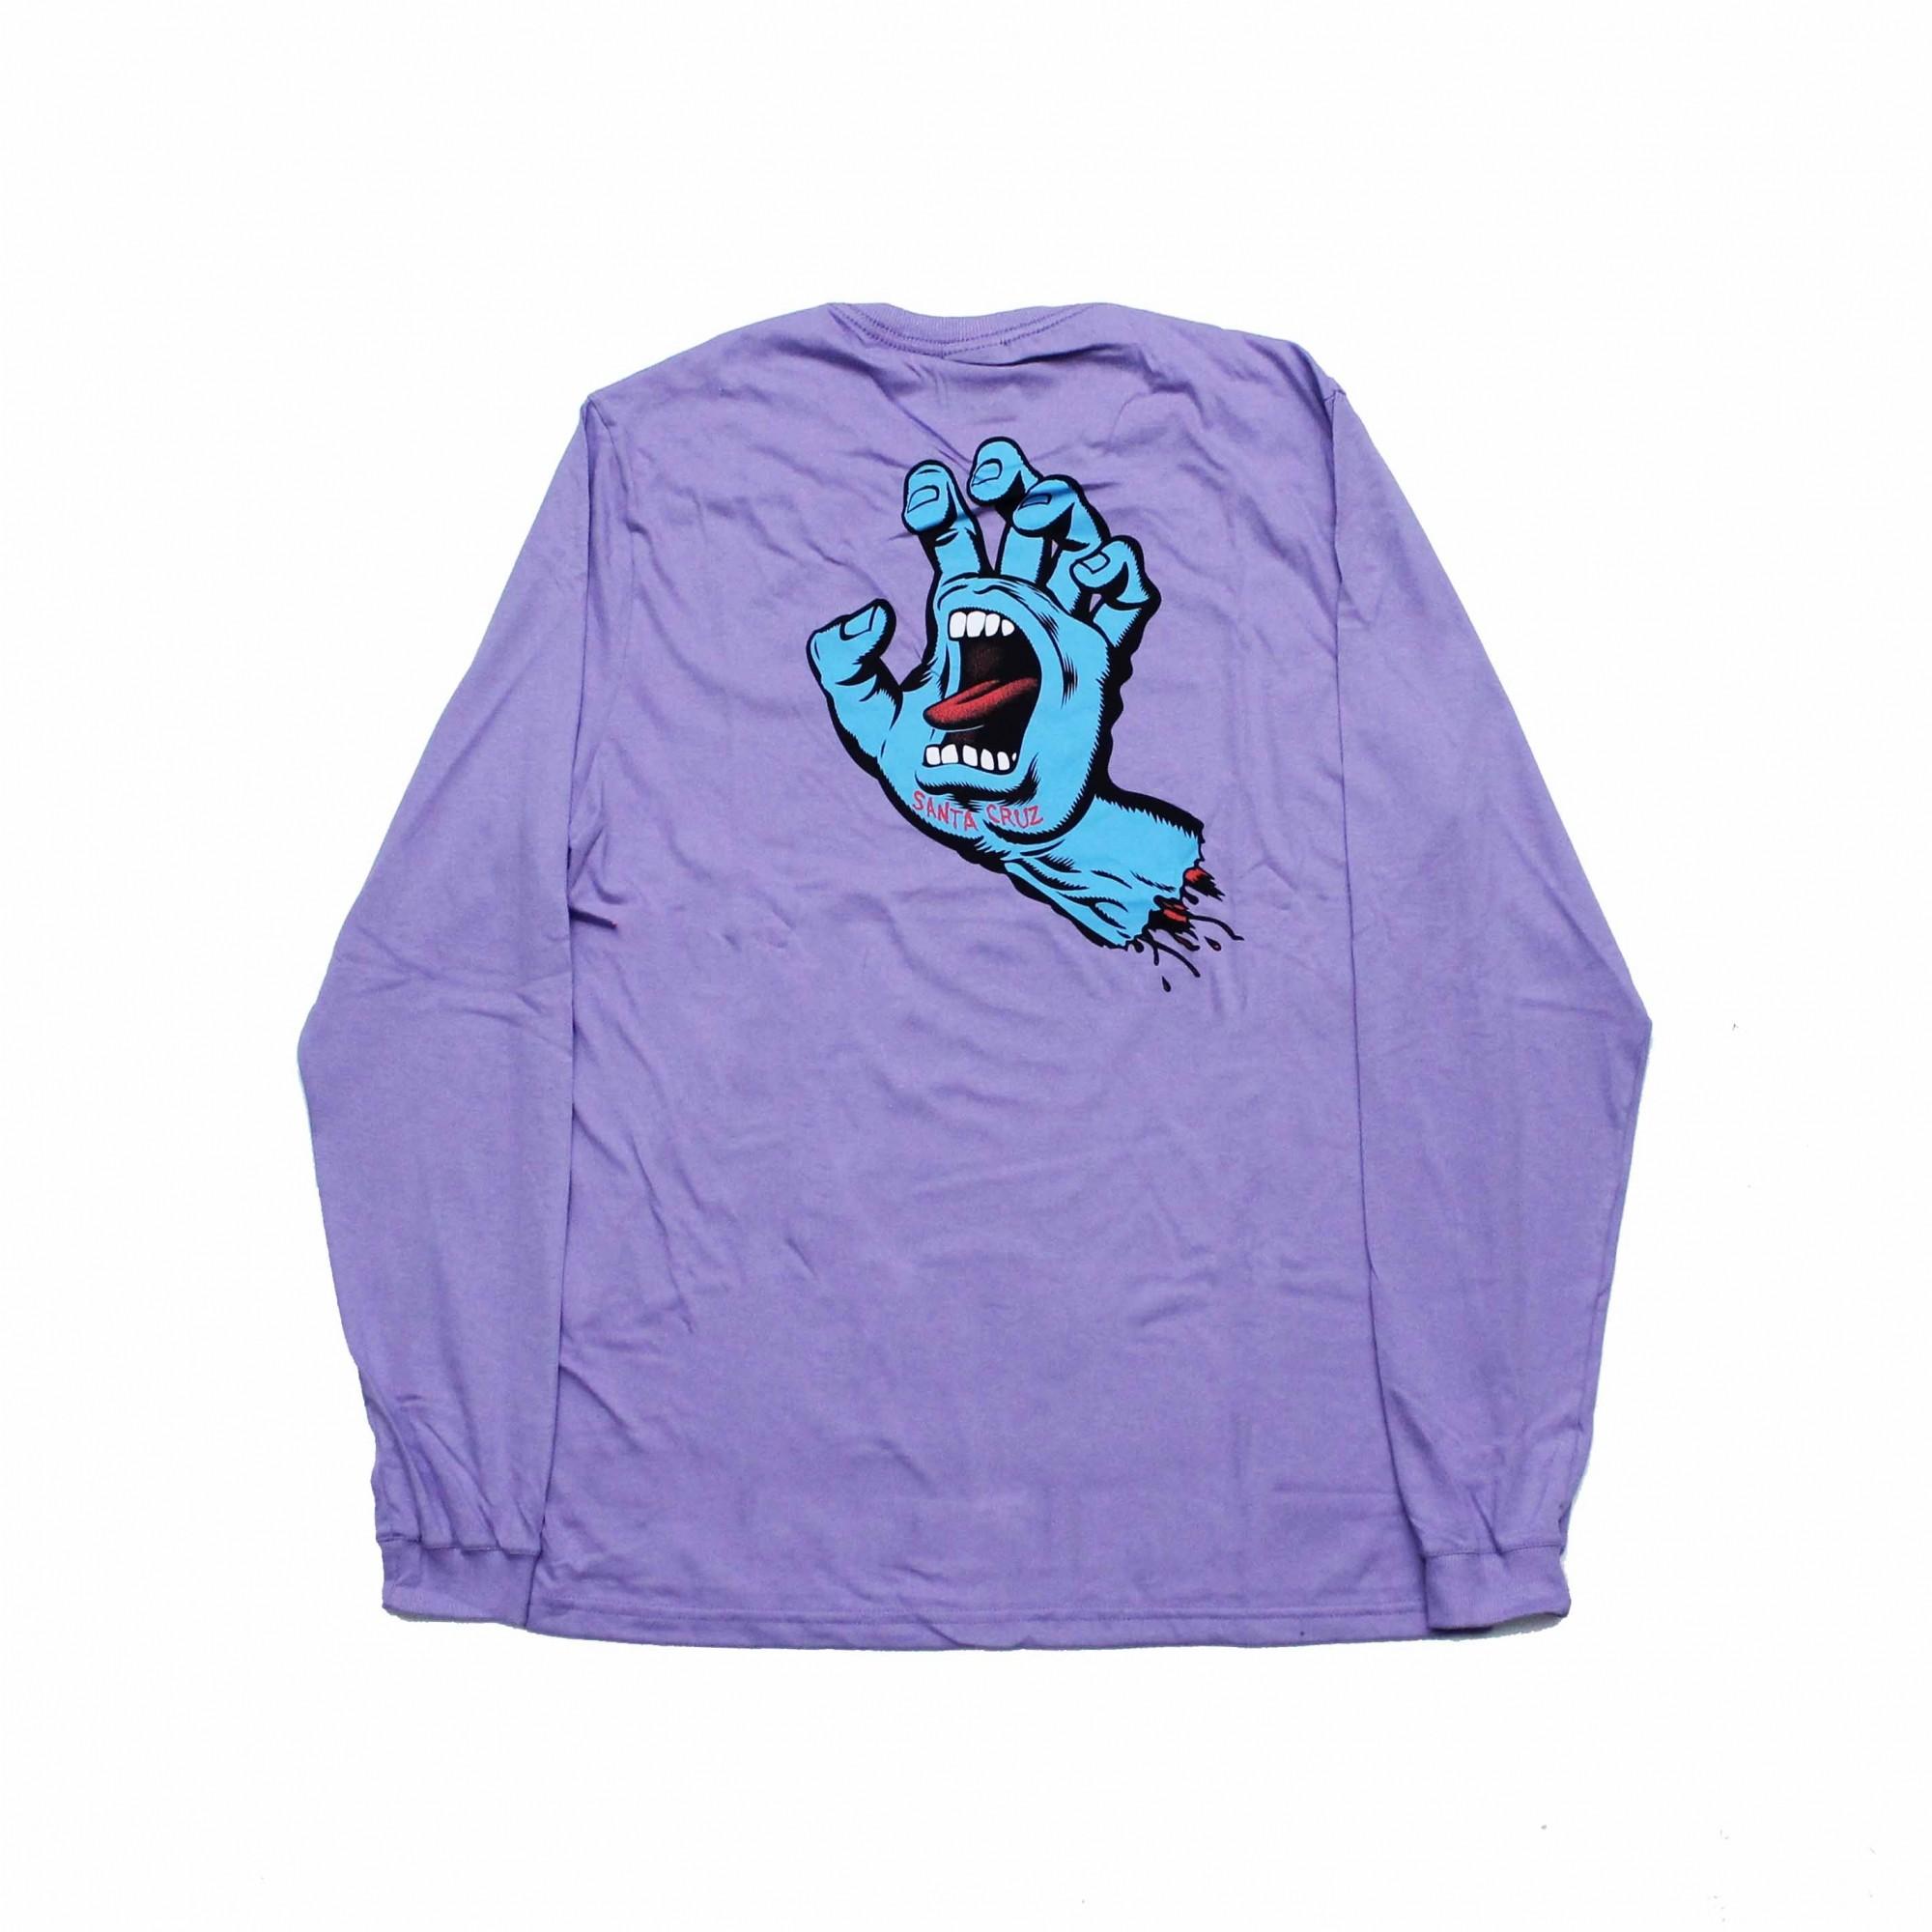 Camiseta Manga Longa Santa Cruz Frontandback Screaming Hand - Lilás